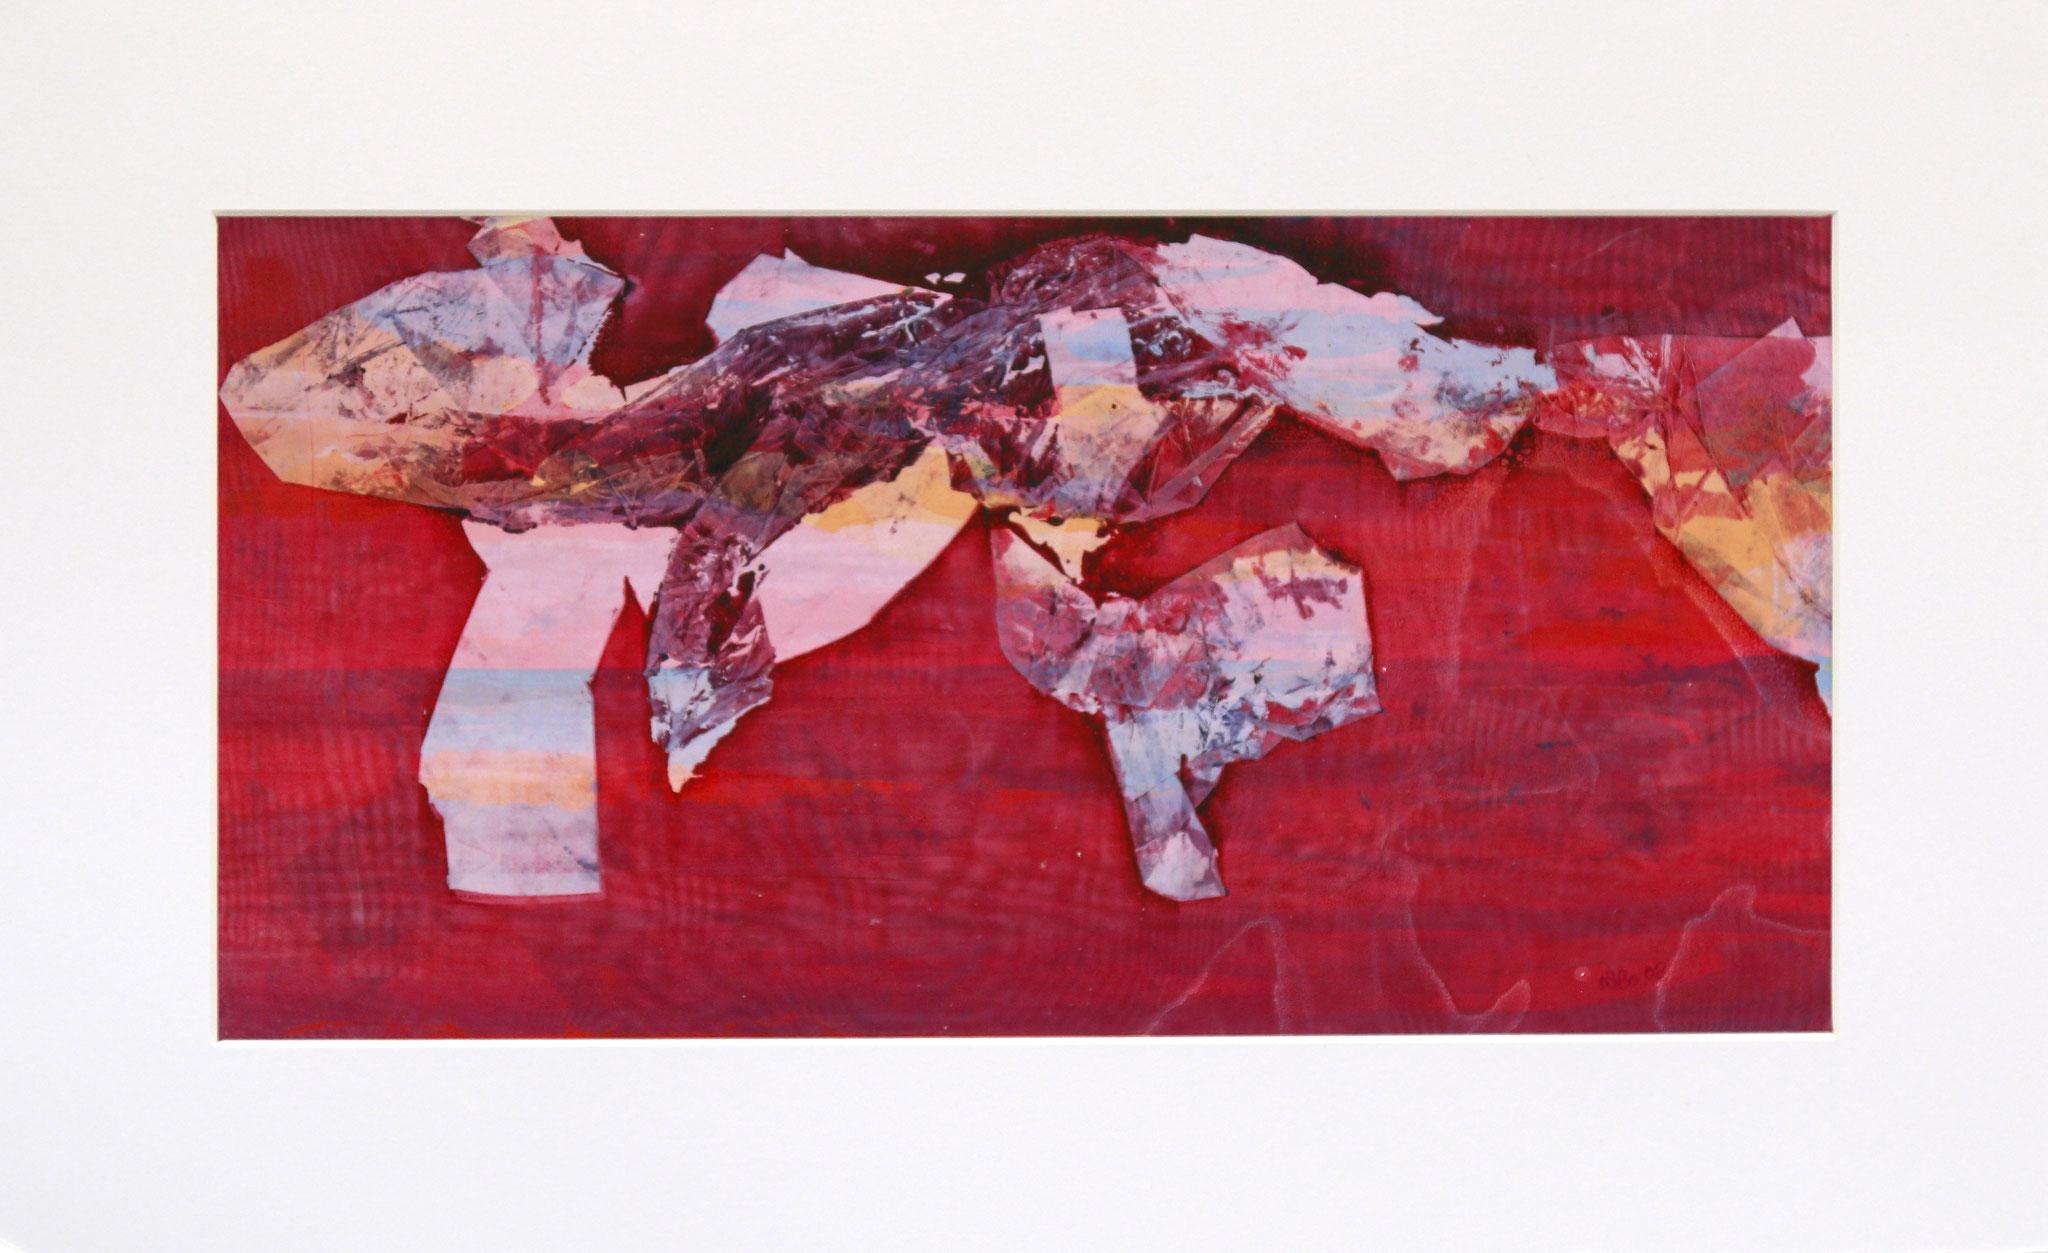 Untitled 46 x 23 cm Mixed media (59 x 36 cm mounted)